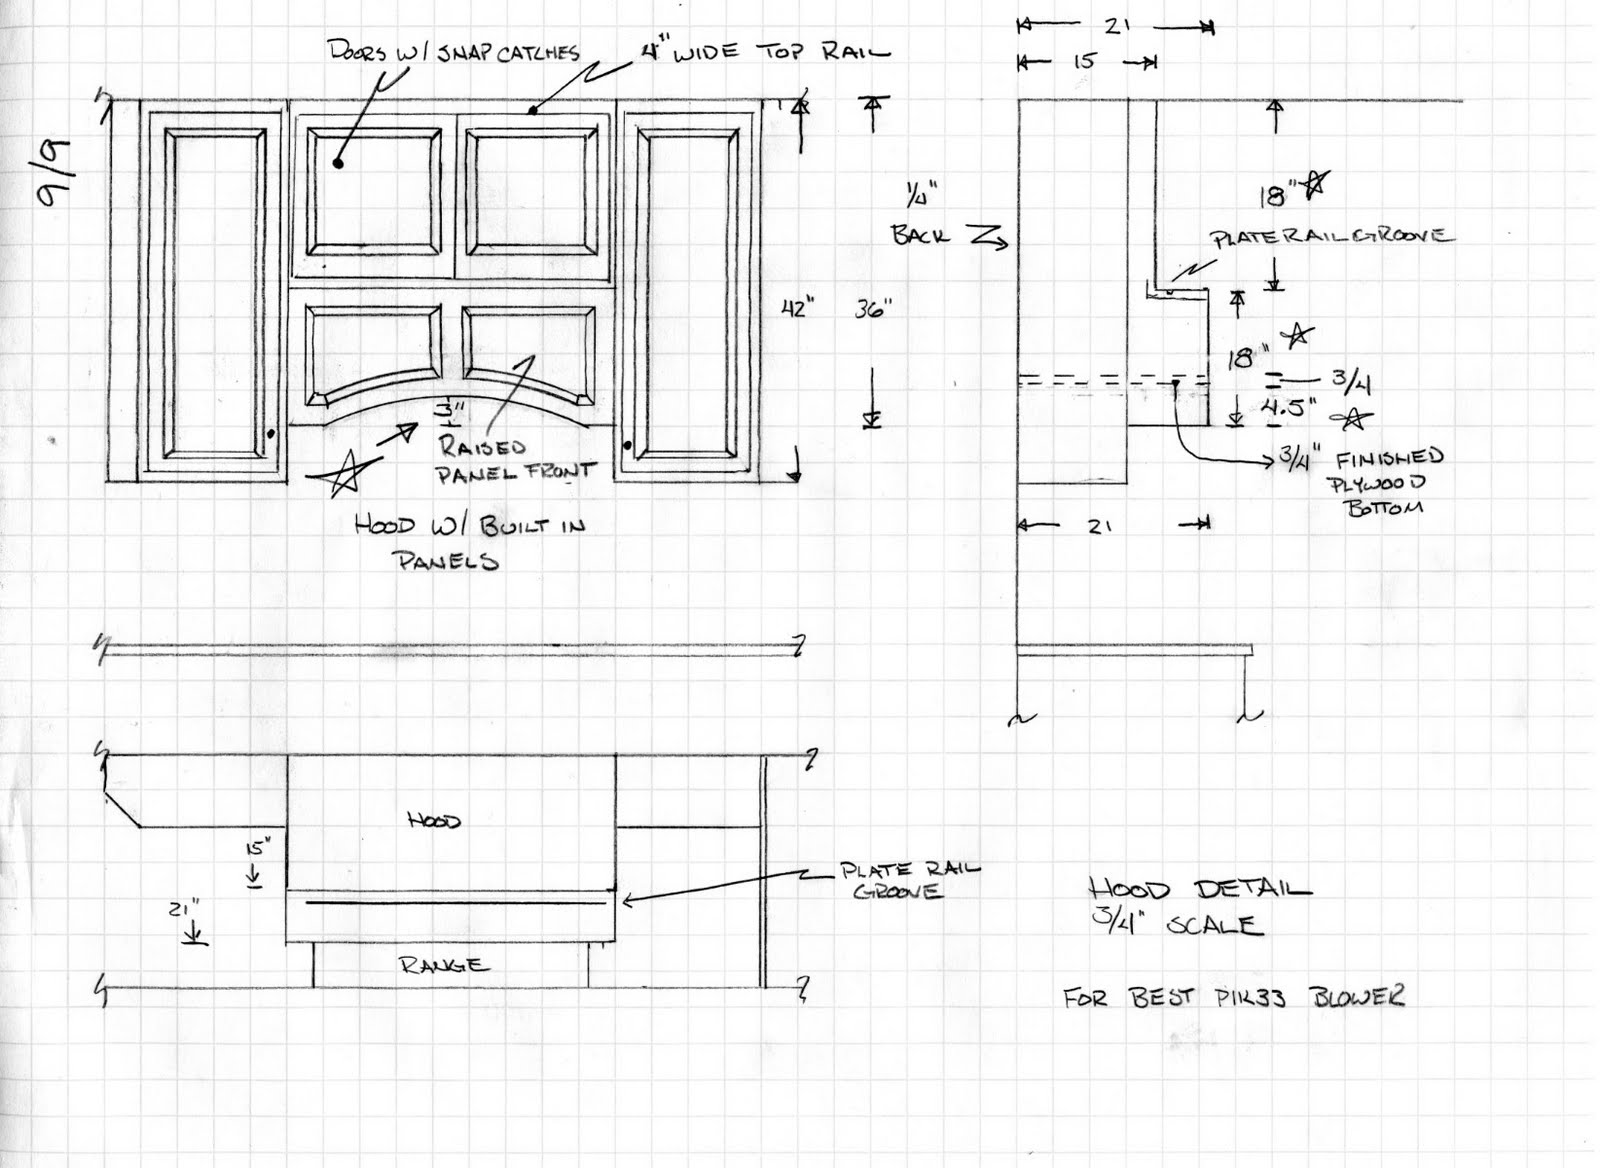 Best Kitchen Gallery: Doug Bolt Woodworking 2011 of Kitchen Hoods Design Drawings on rachelxblog.com